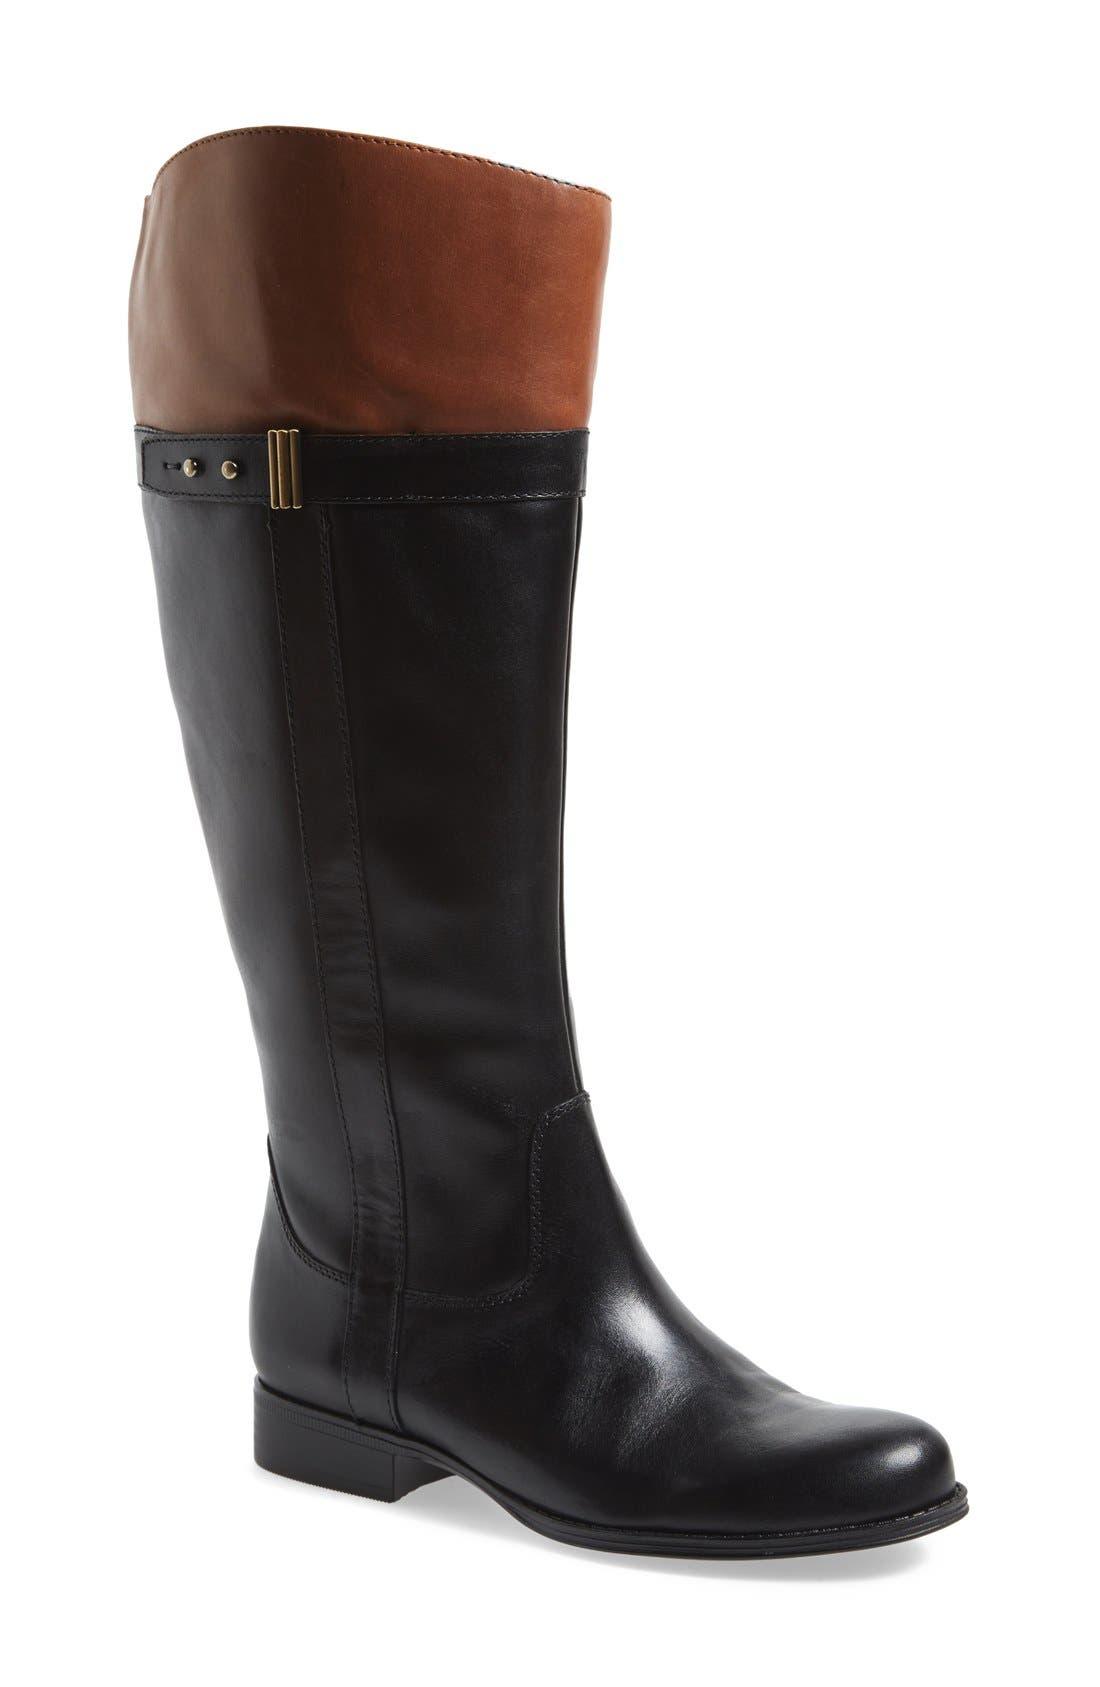 Main Image - Naturalizer 'Josette' Knee High Boot (Wide Calf) (Women)